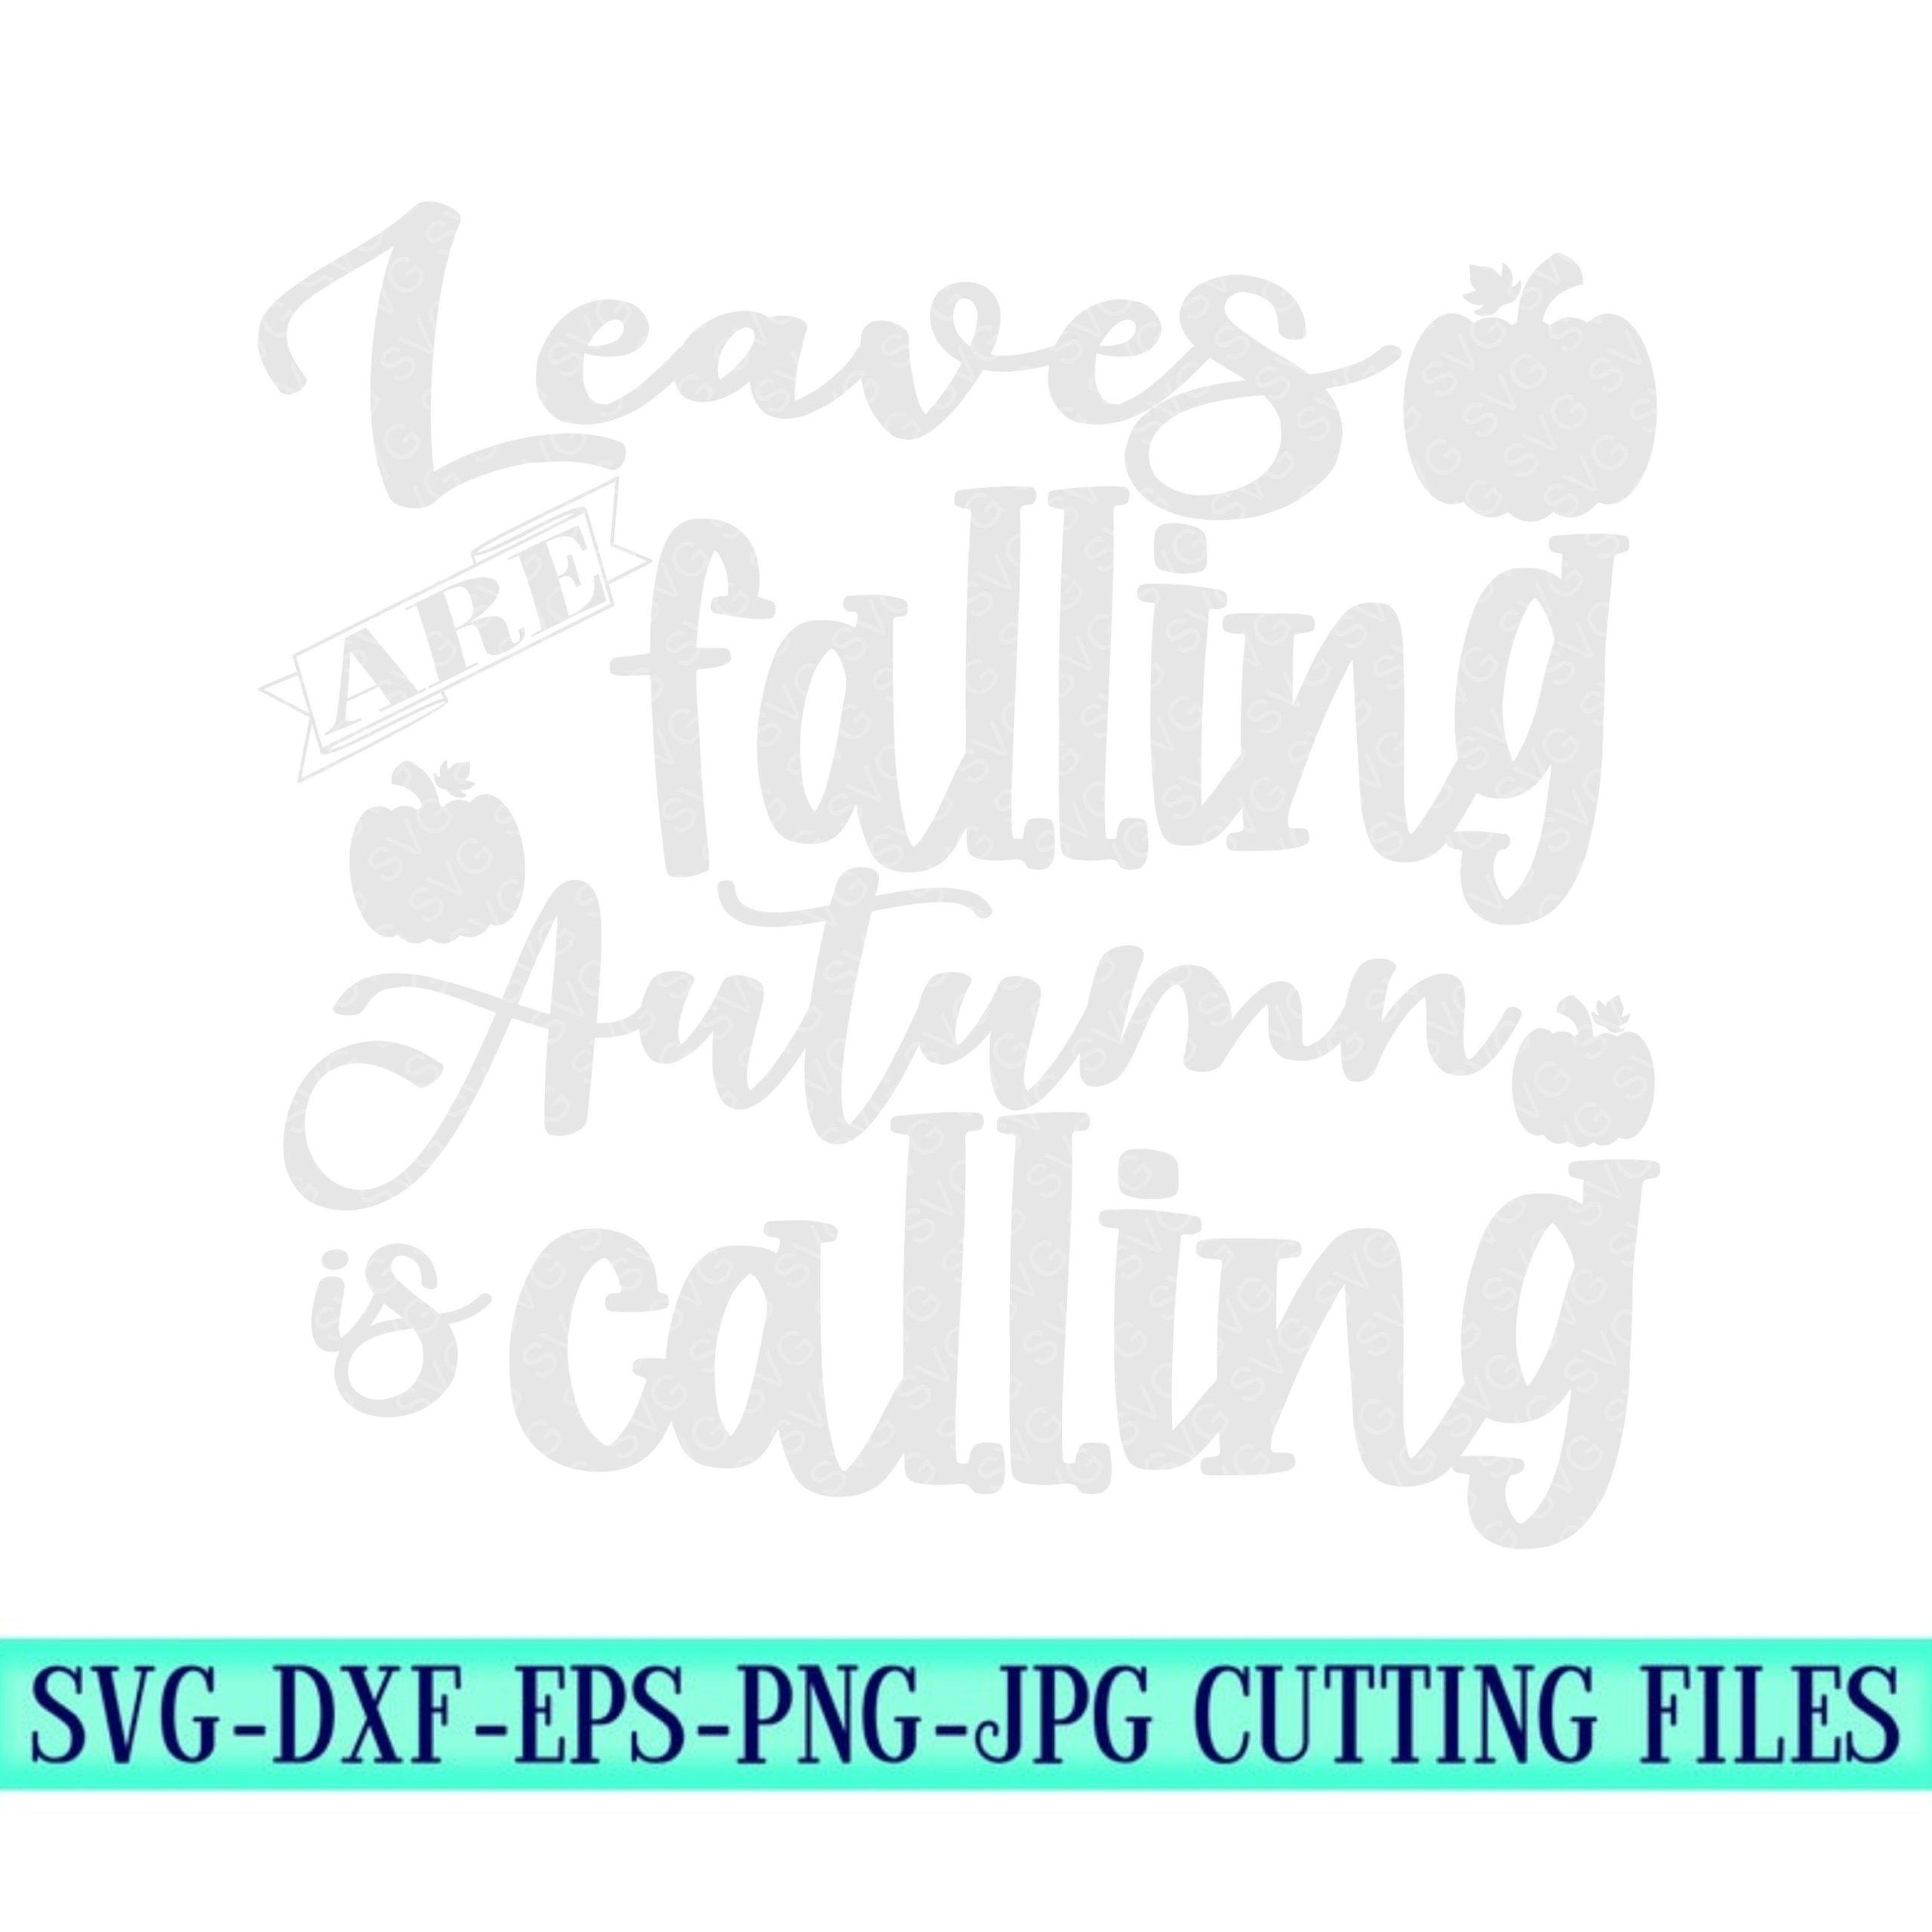 Leaves-are-falling-autumn-is-calling-svgpumpkin-svgfall-svgpumpkin-spice-svgpumpkin-svg-designsfall-svg-designfall-cut-filecricut-svg-5f6f6ff0